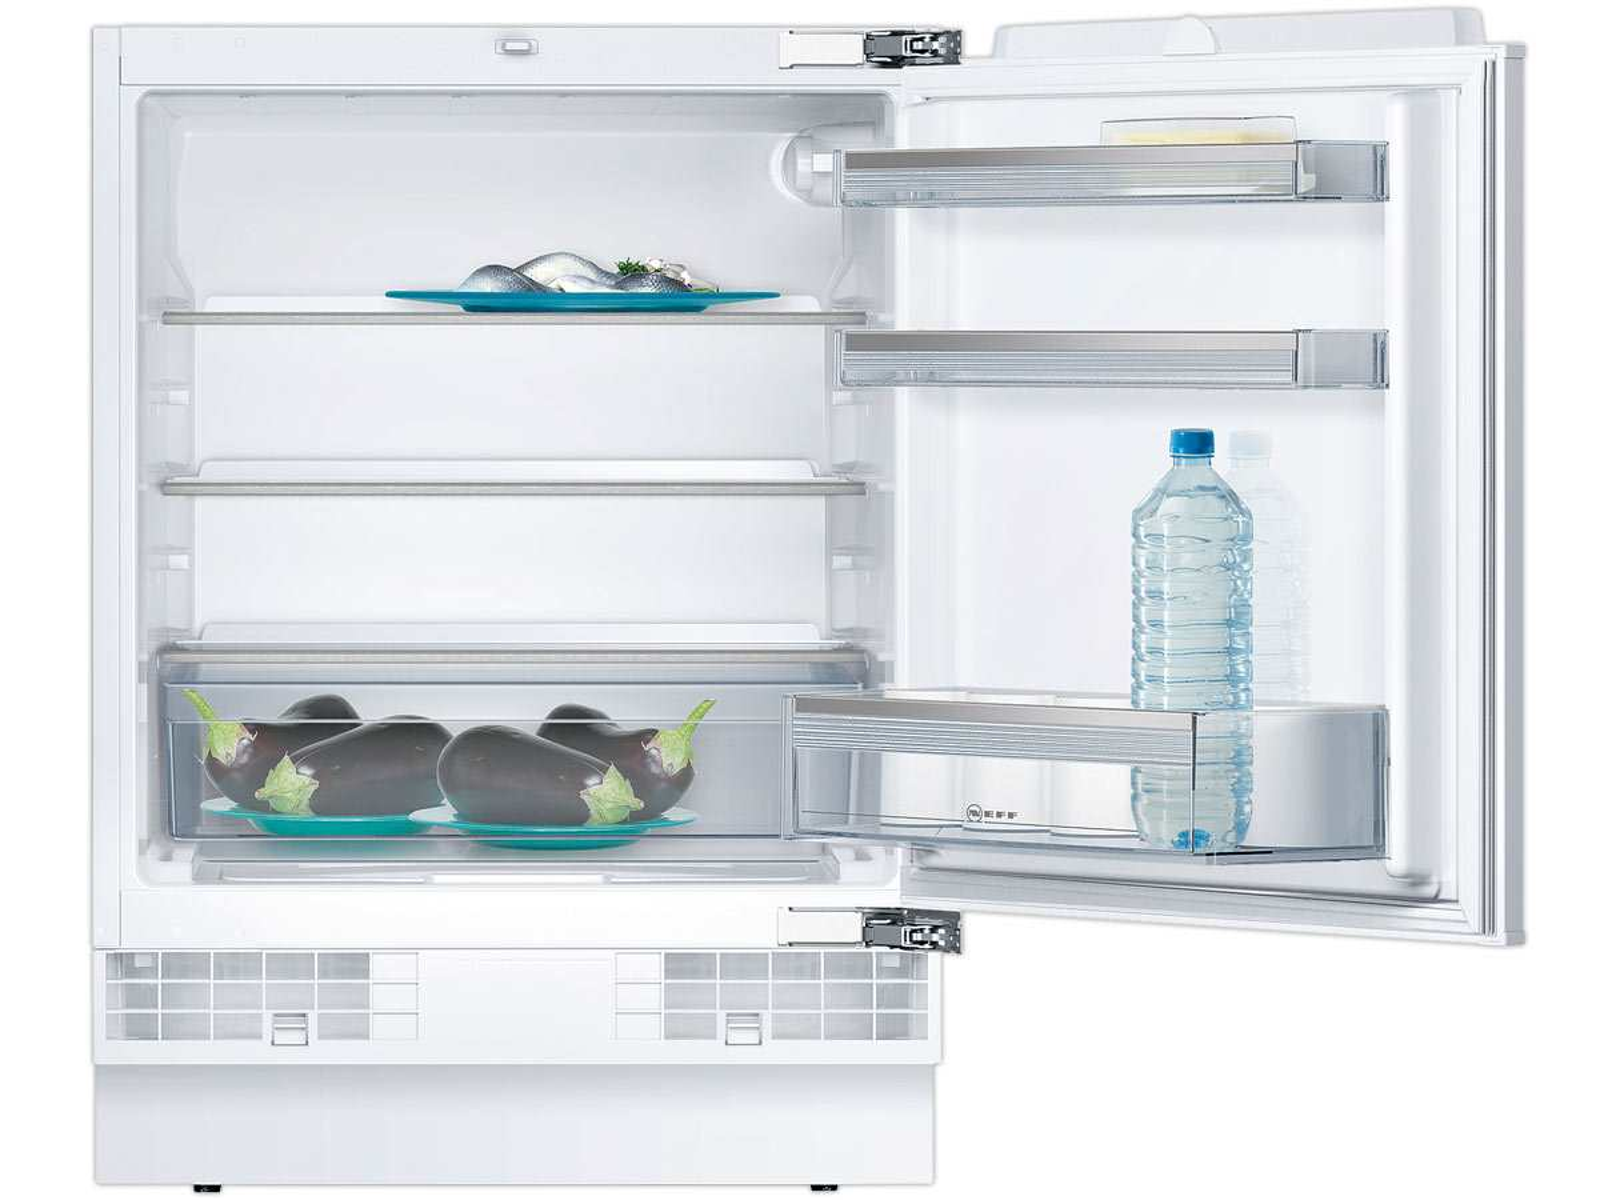 Neff KU 216 A2 Unterbaukühlschrank